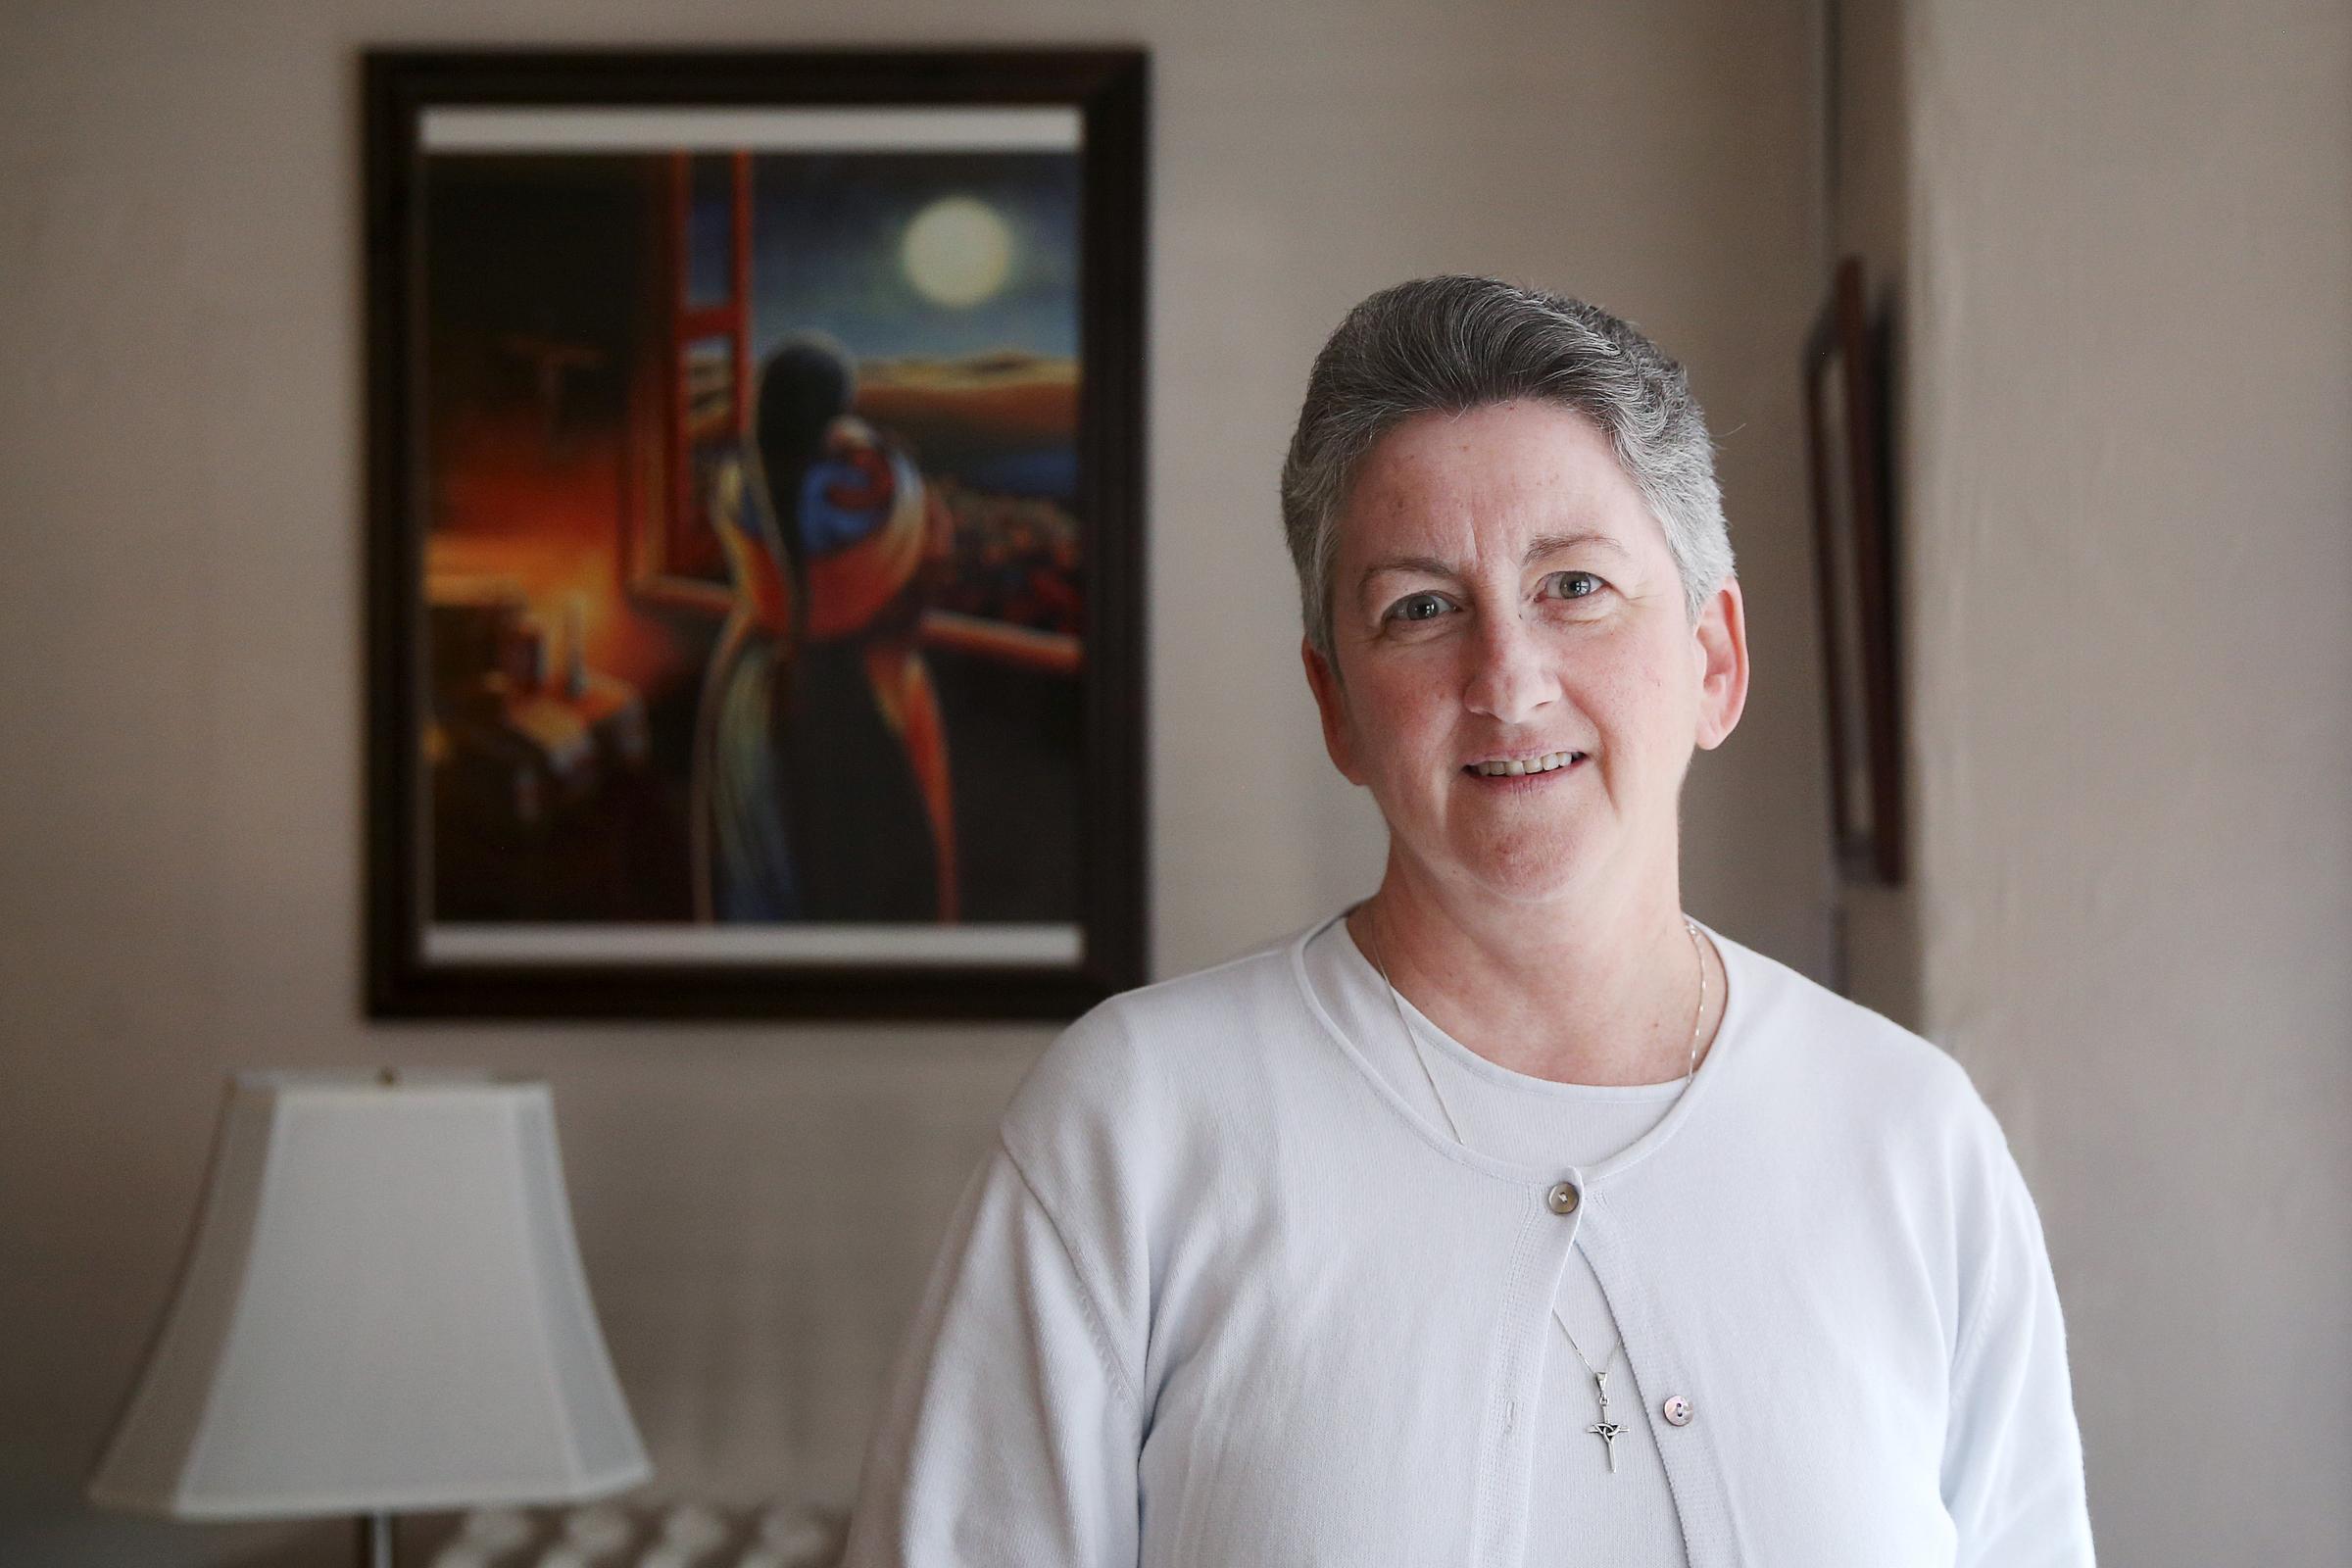 Sister Helen Cole has been working in Camden since 1991.